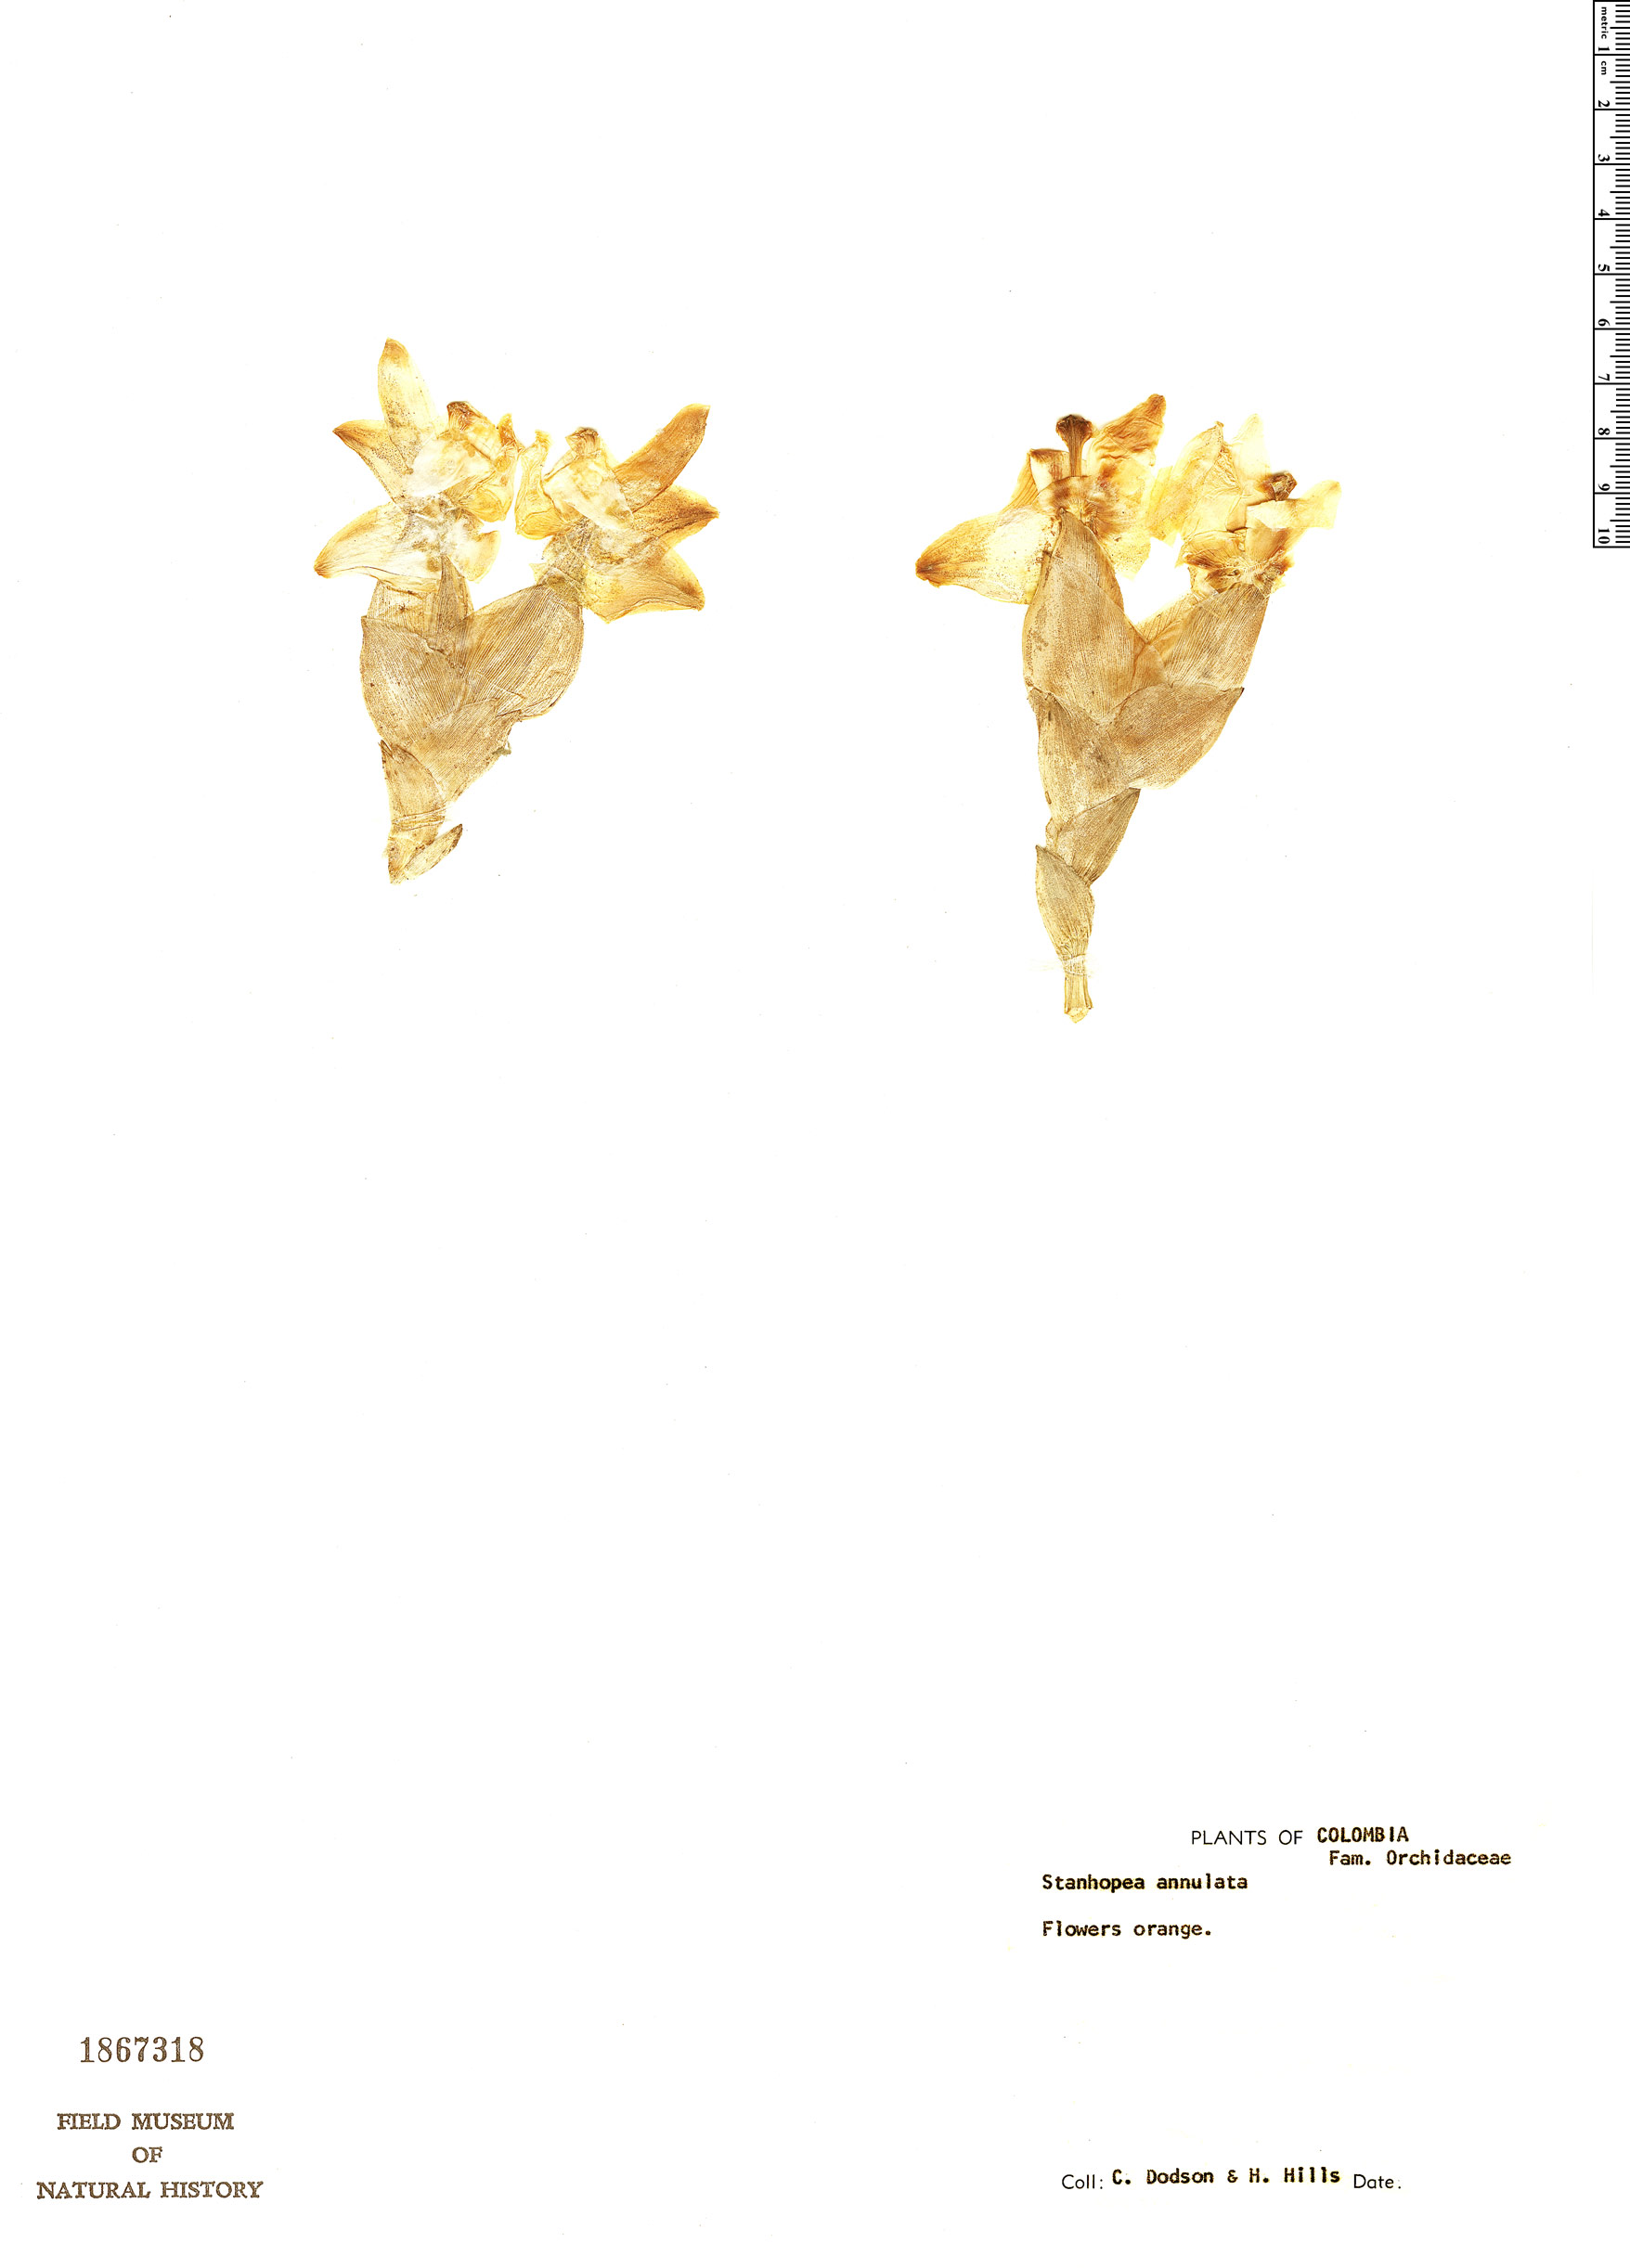 Specimen: Stanhopea annulata